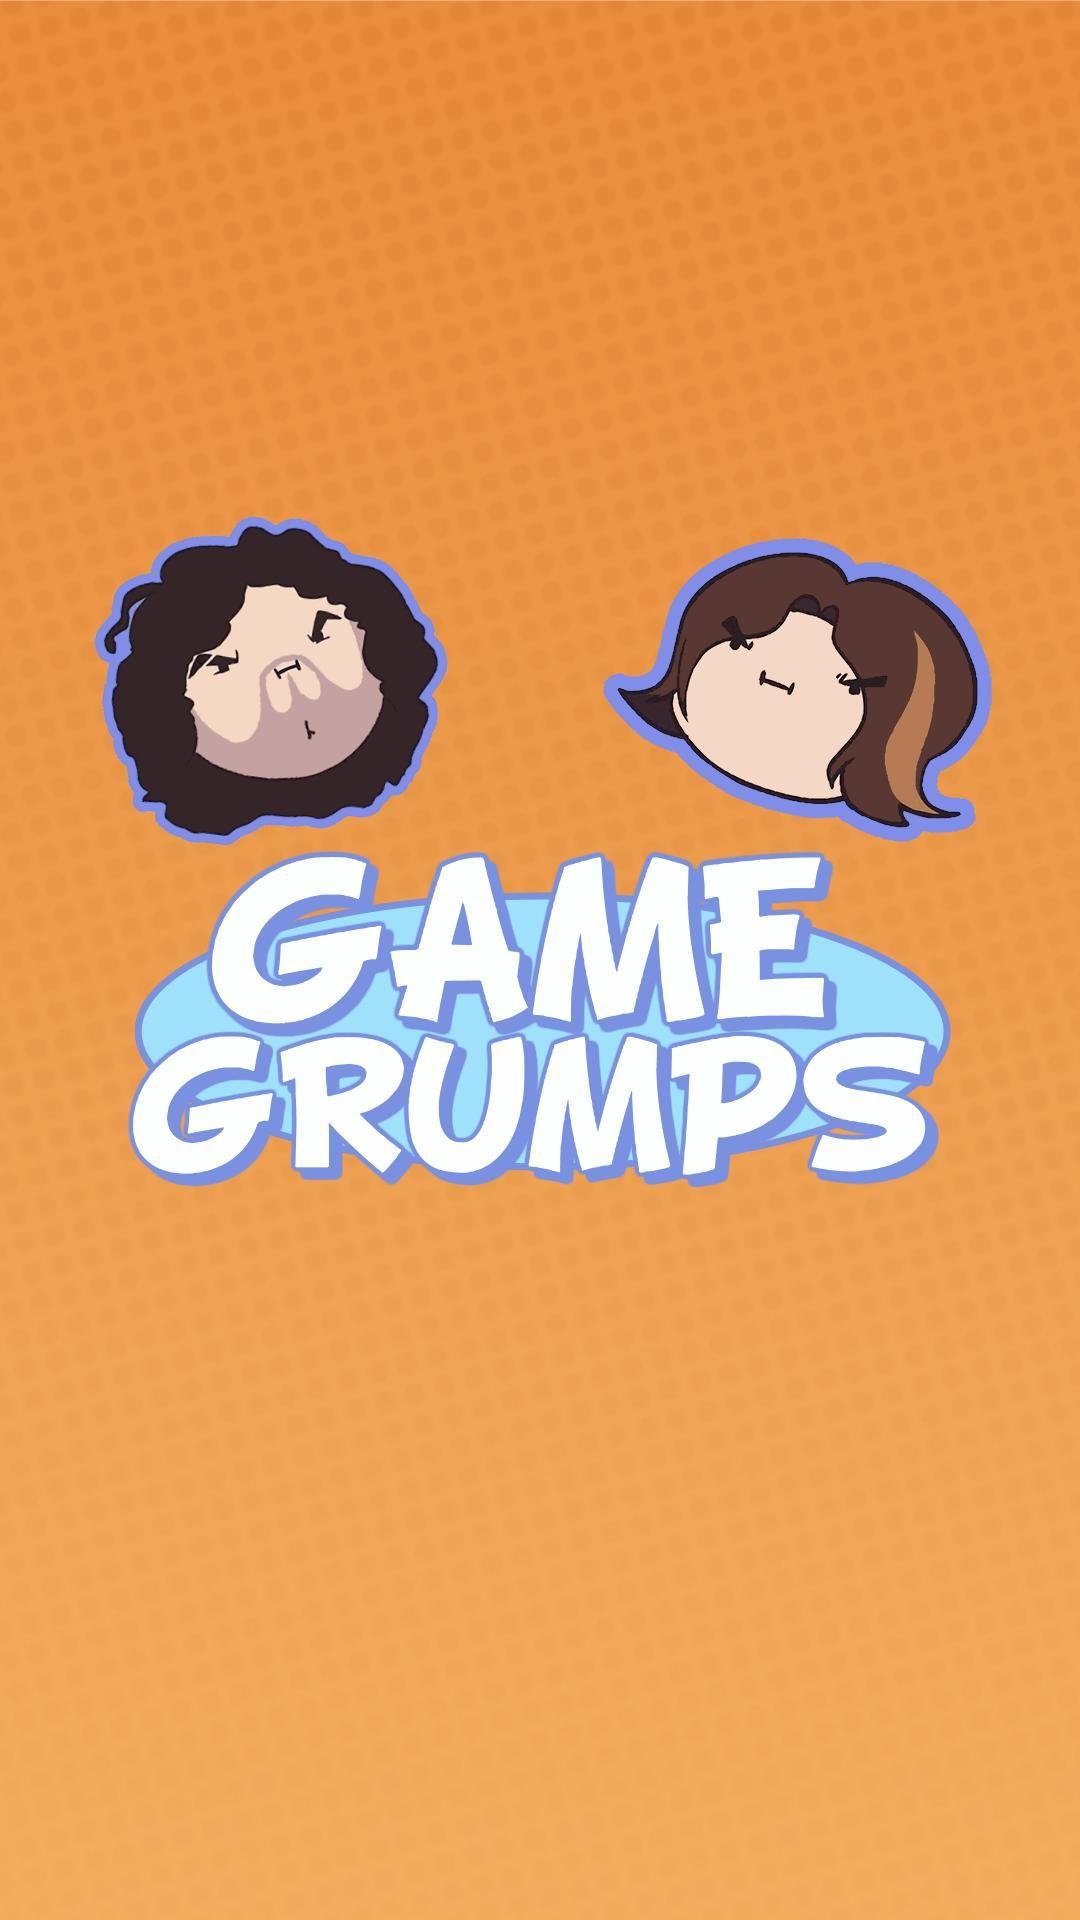 Pin By Ravenationxx3 On Tubers Game Grumps Grump Nerd